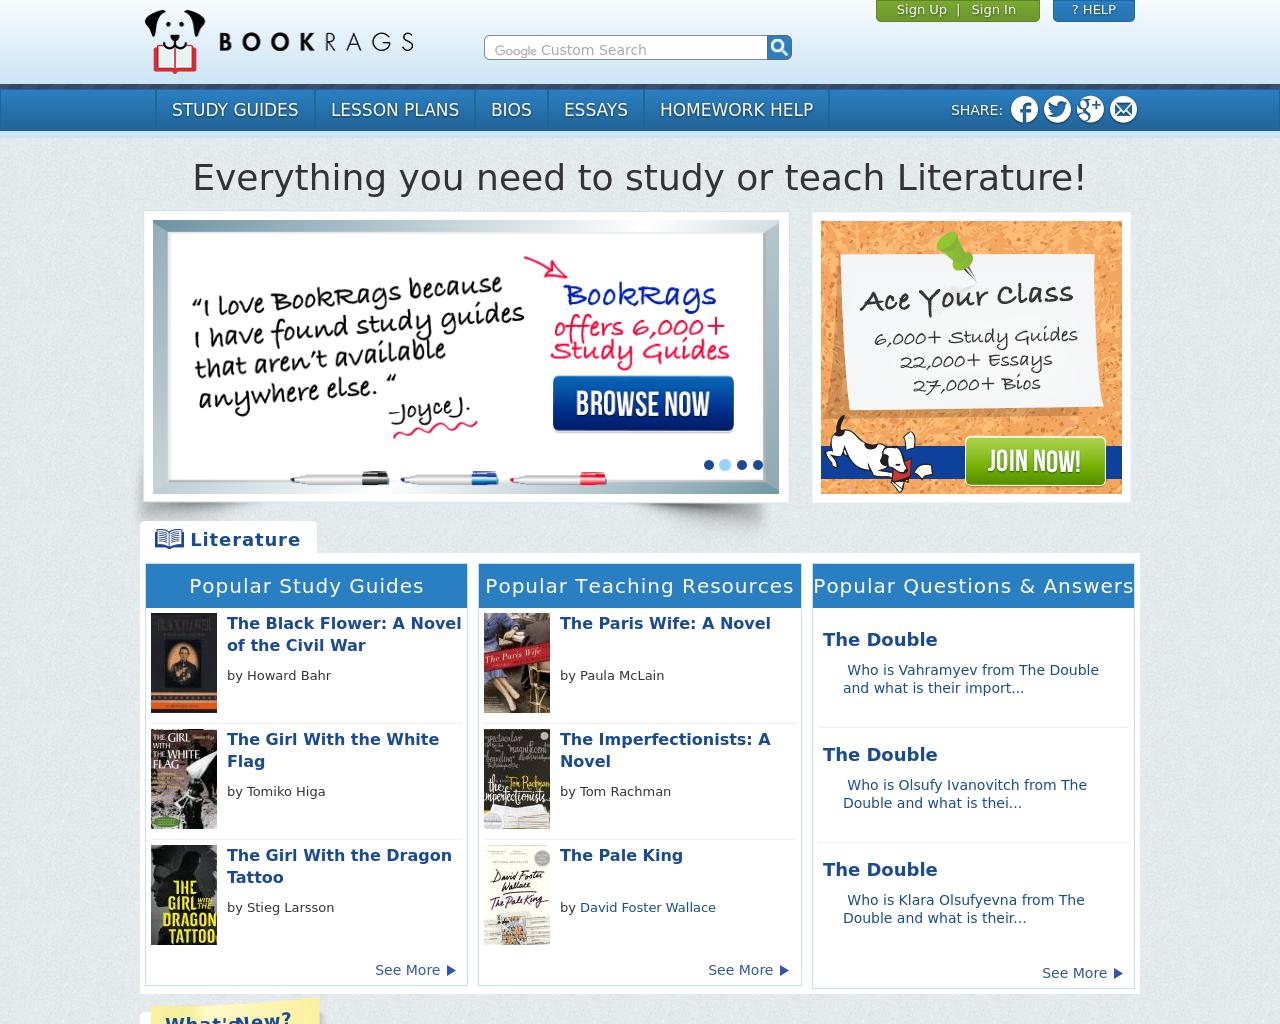 BookRags-Media-Advertising-Reviews-Pricing